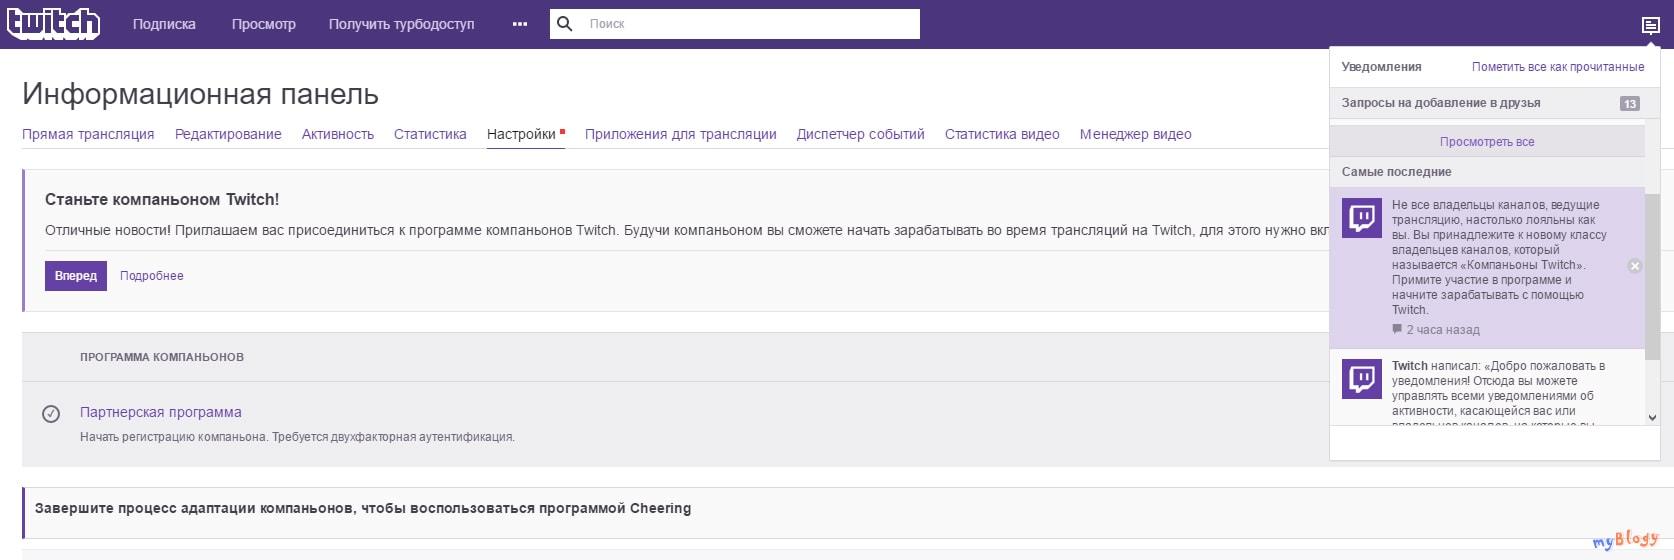 Регистрация компаньона Twitch